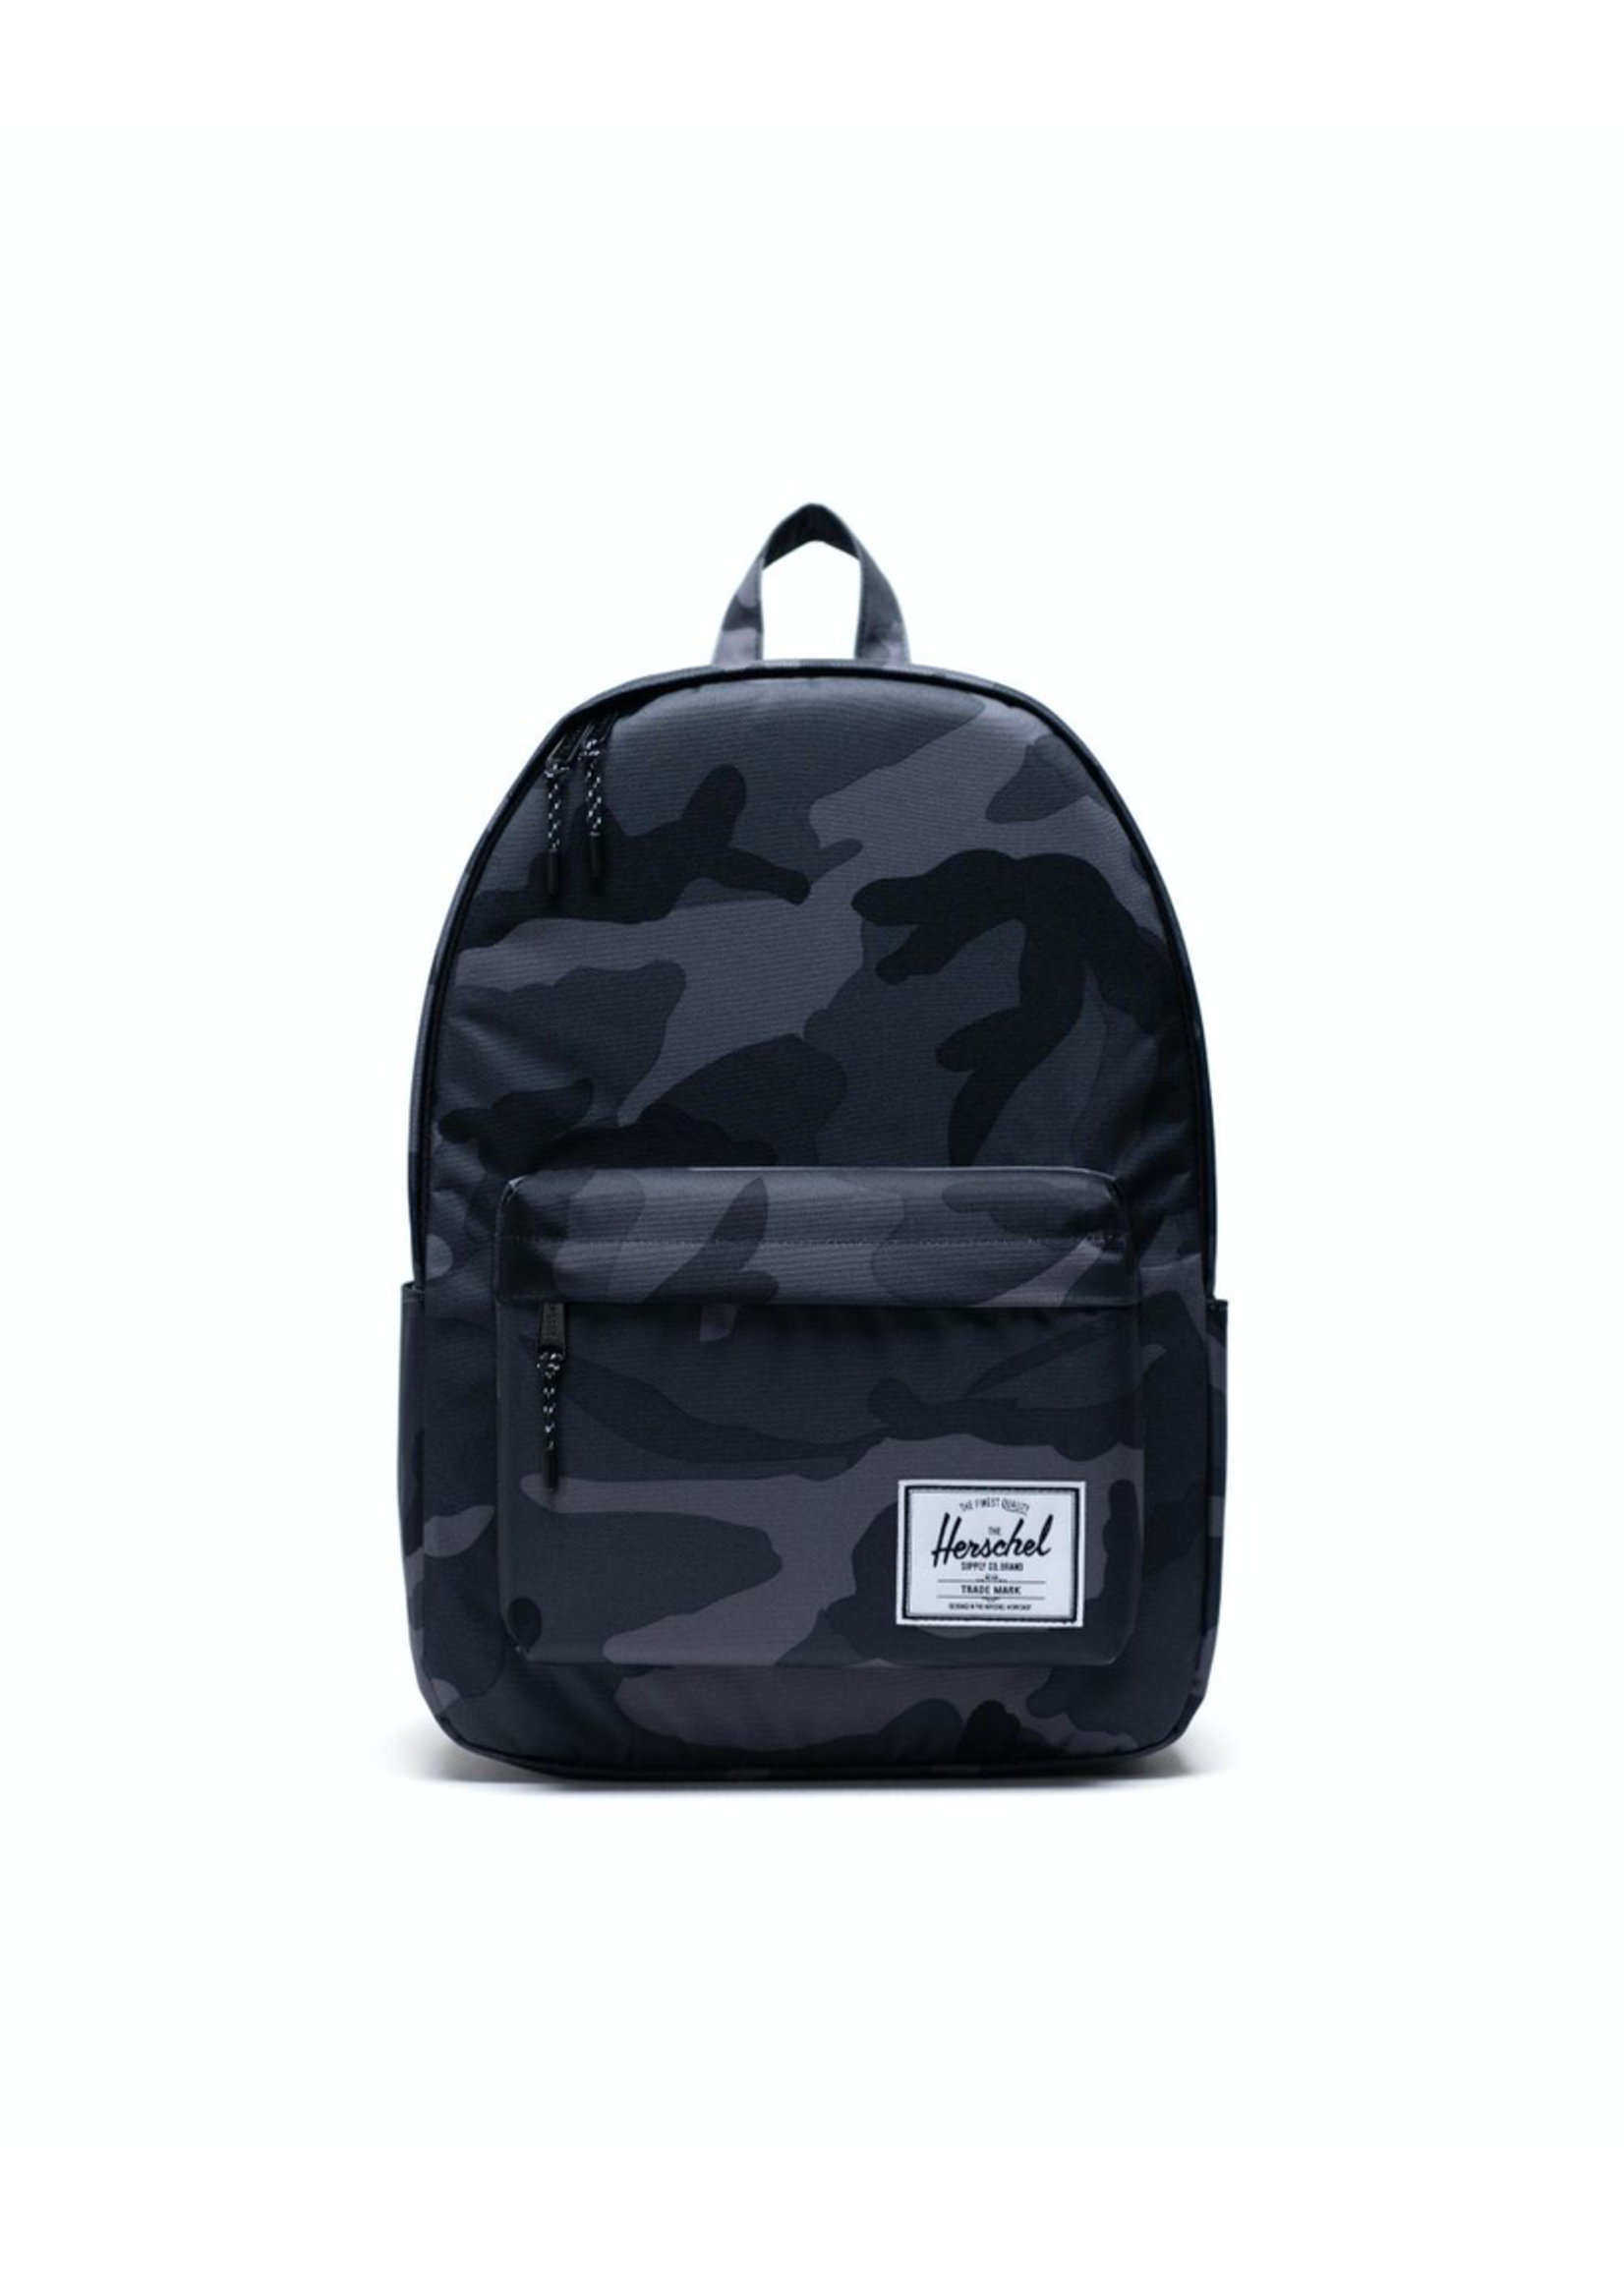 Herschel Supply Co. Herschel Supply, Classic Backpack | XL in Night Camo, 30L